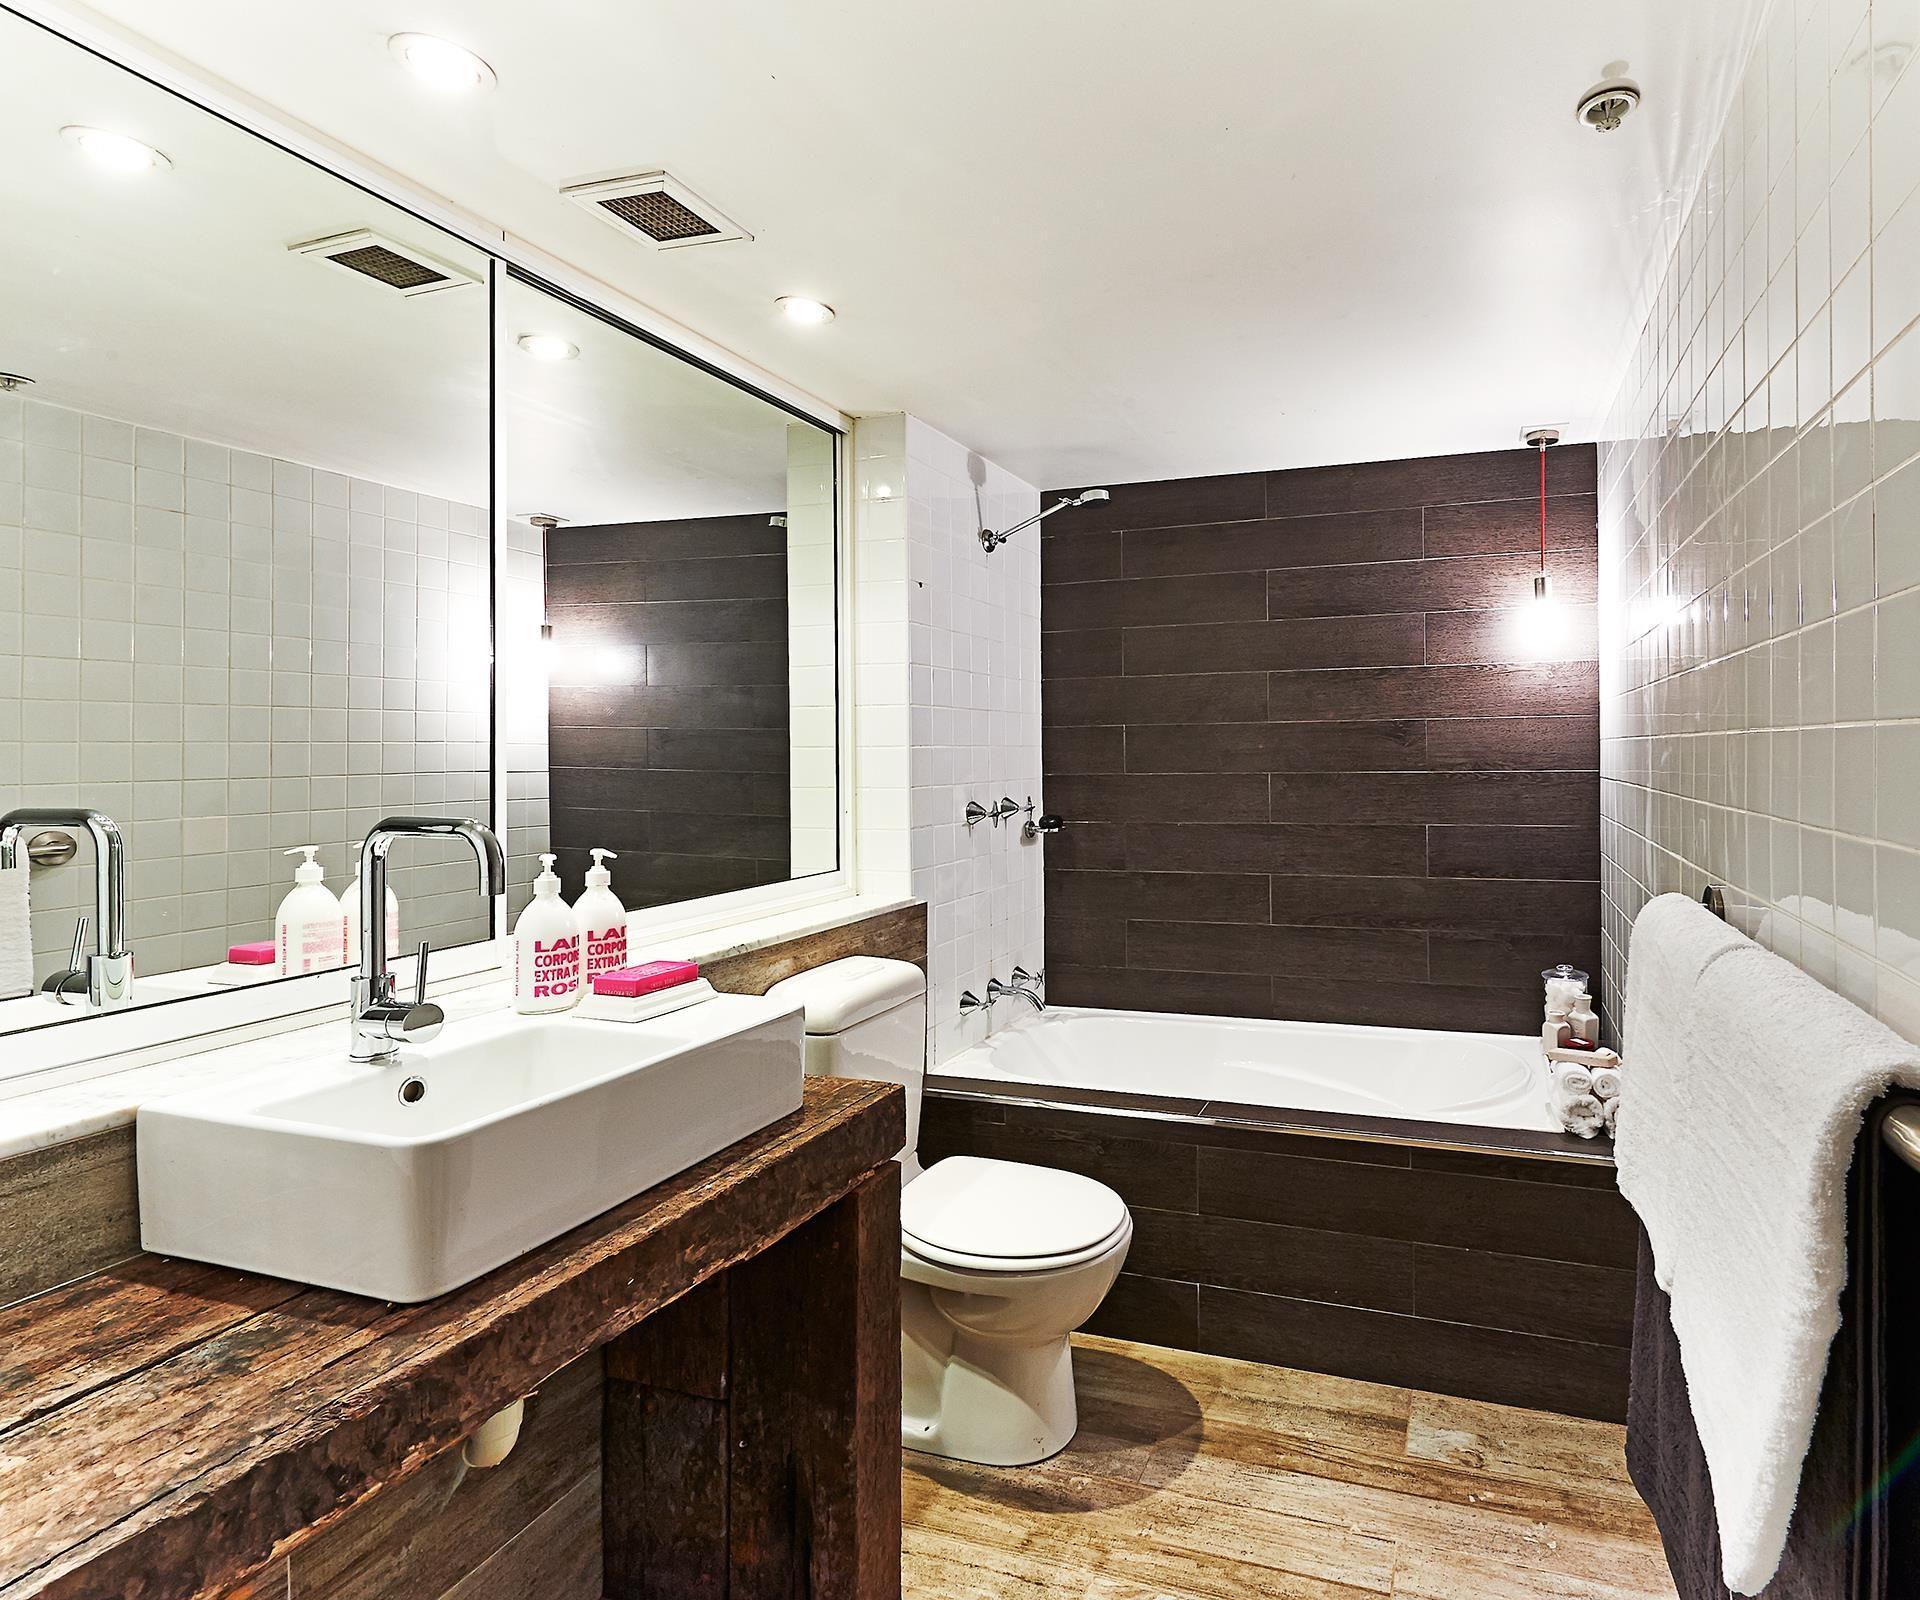 Four Budget Ways to Update Your Bathroom | Diy bathroom ...